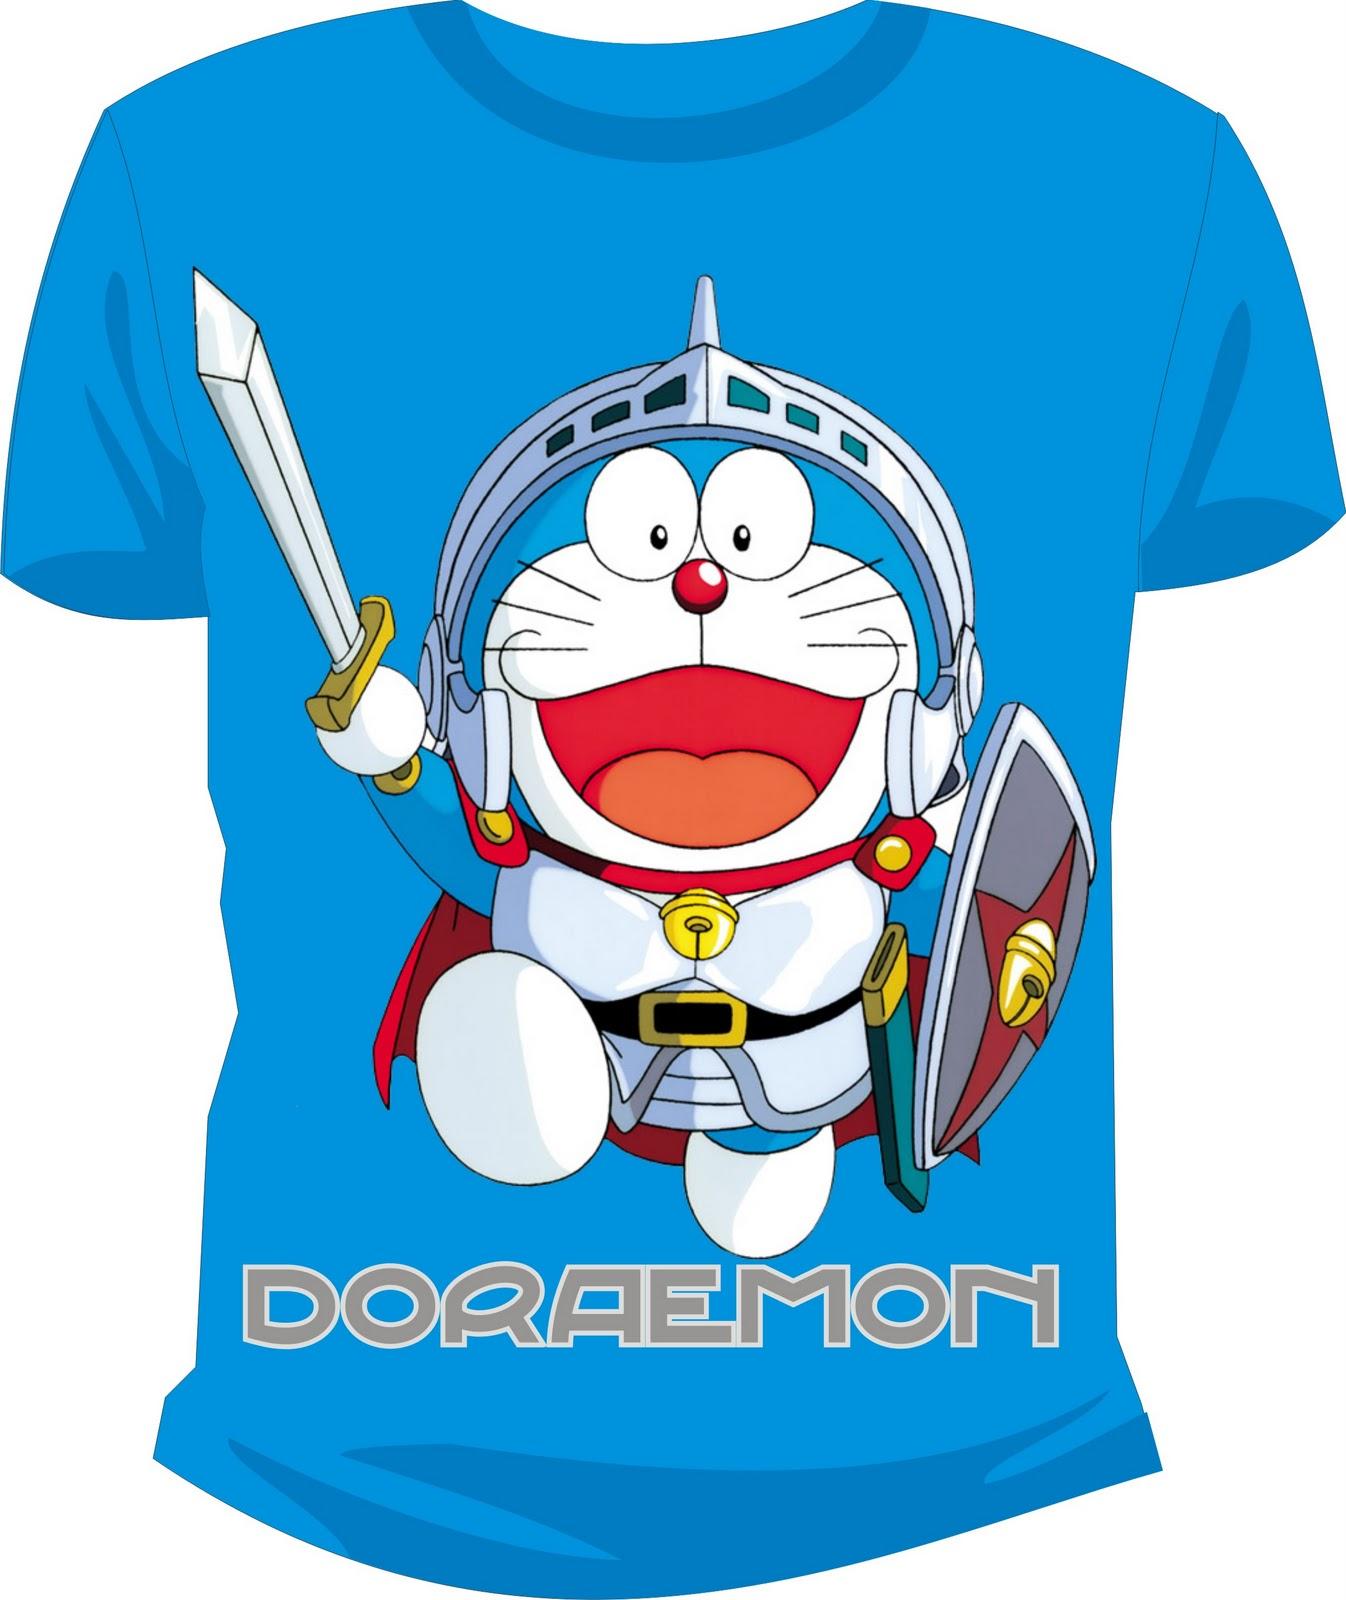 36e0f0c99 Doraemon clothes - Doraemon clothing | Compare Prices at Nextag. Buy ...